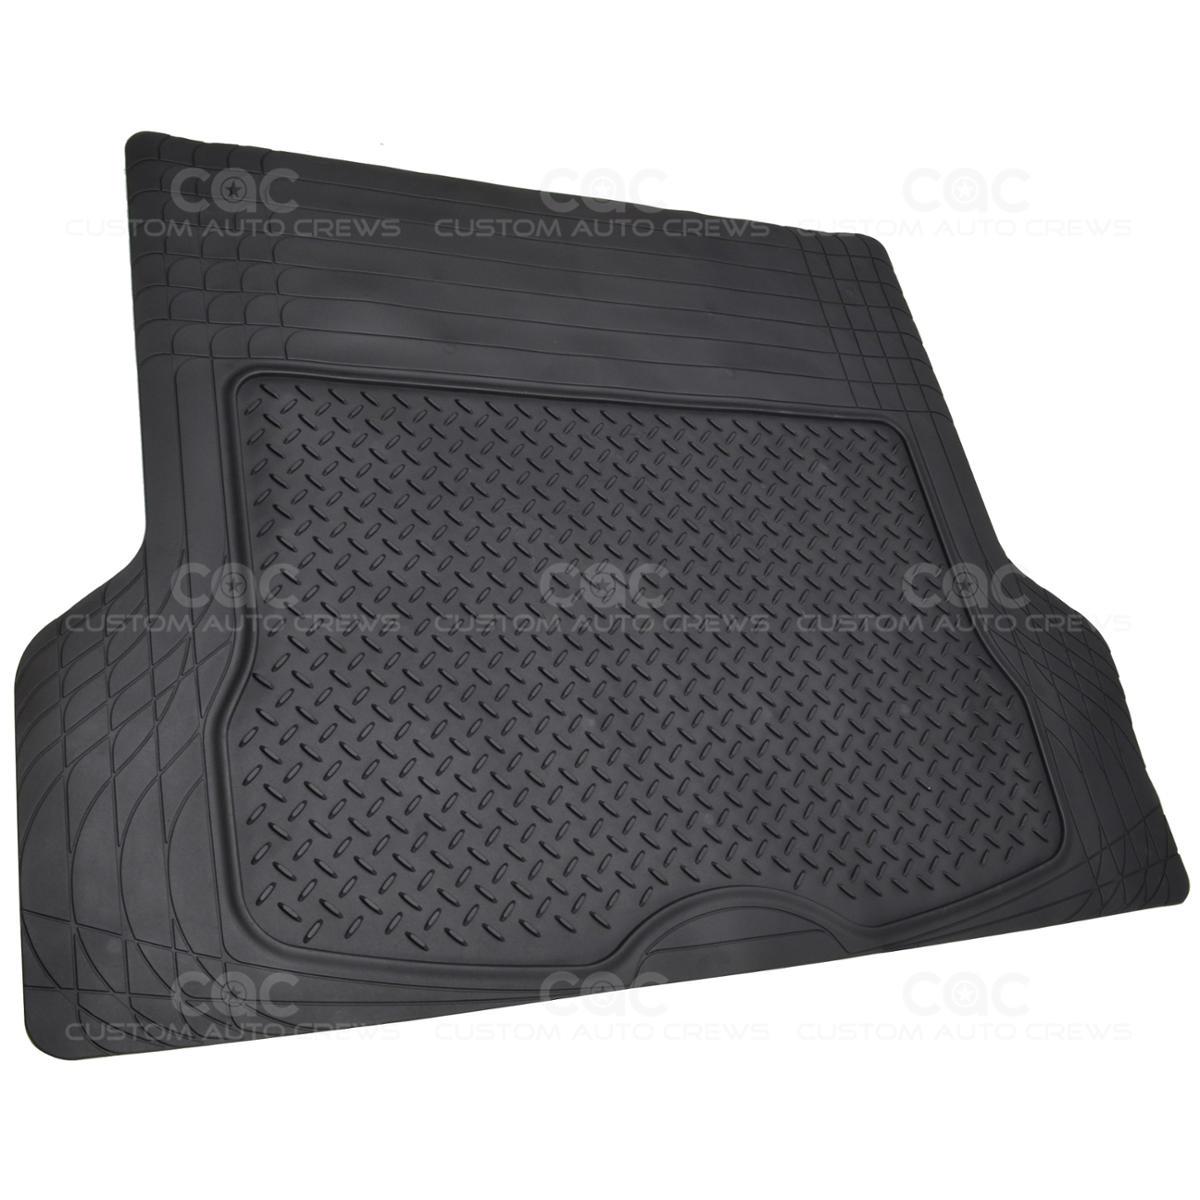 Rubber floor mats for lincoln mkx - Motor Trend Deep Dish Rubber Floor Mats Amp Cargo Set Black Premium 4 Piece Ebay